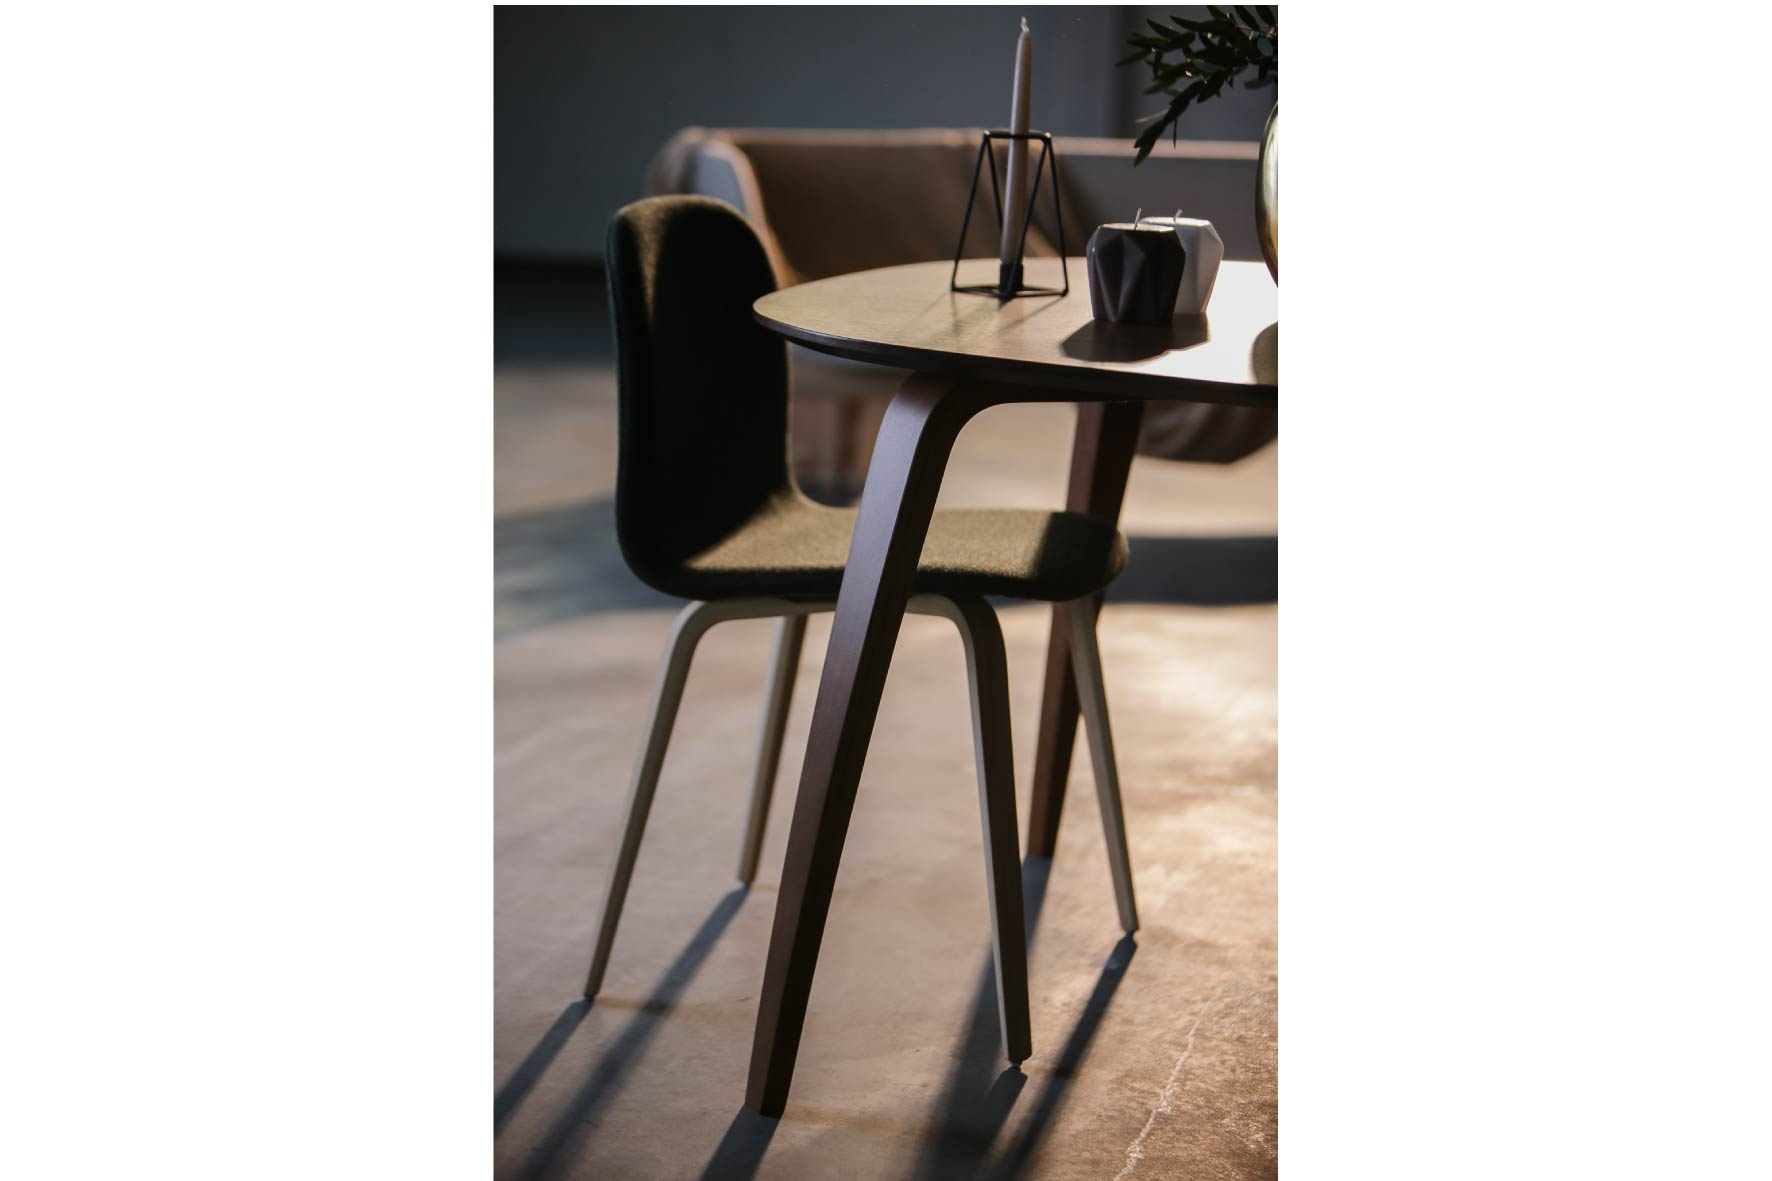 Dižozols bent wood design chairs (6)